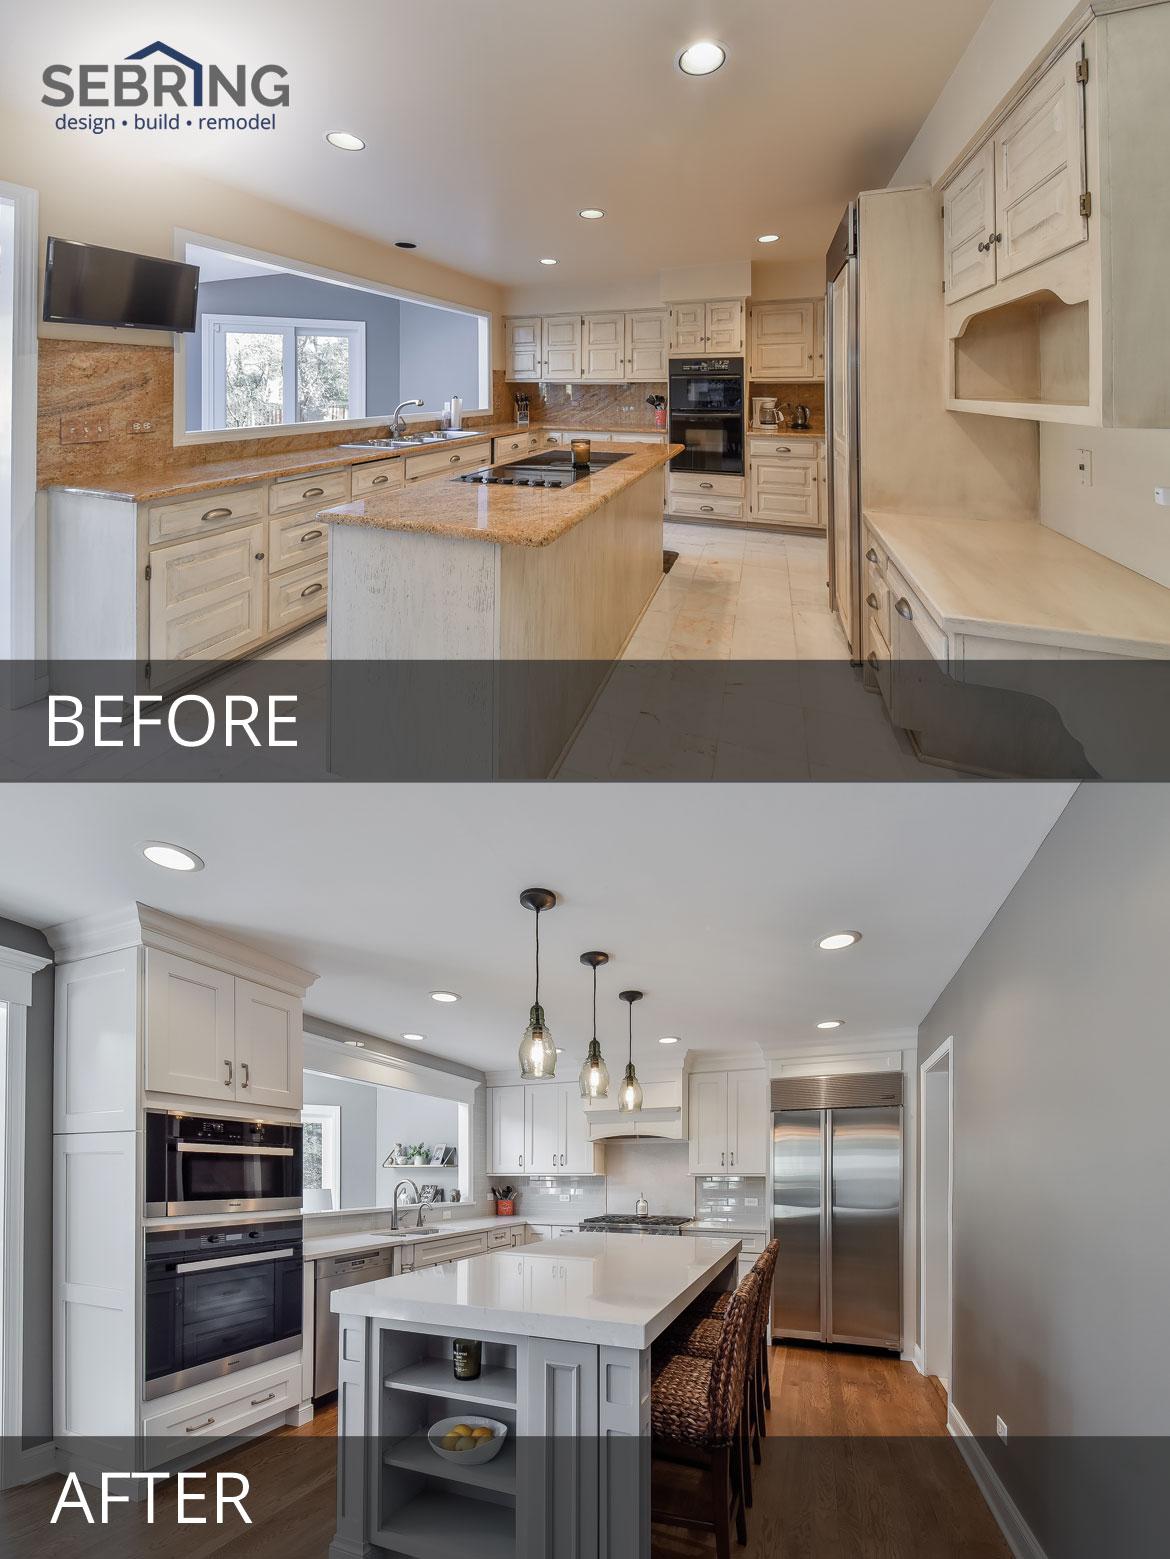 Naperville Kitchen Remodeling Before and After Pictures - Sebring Design Build